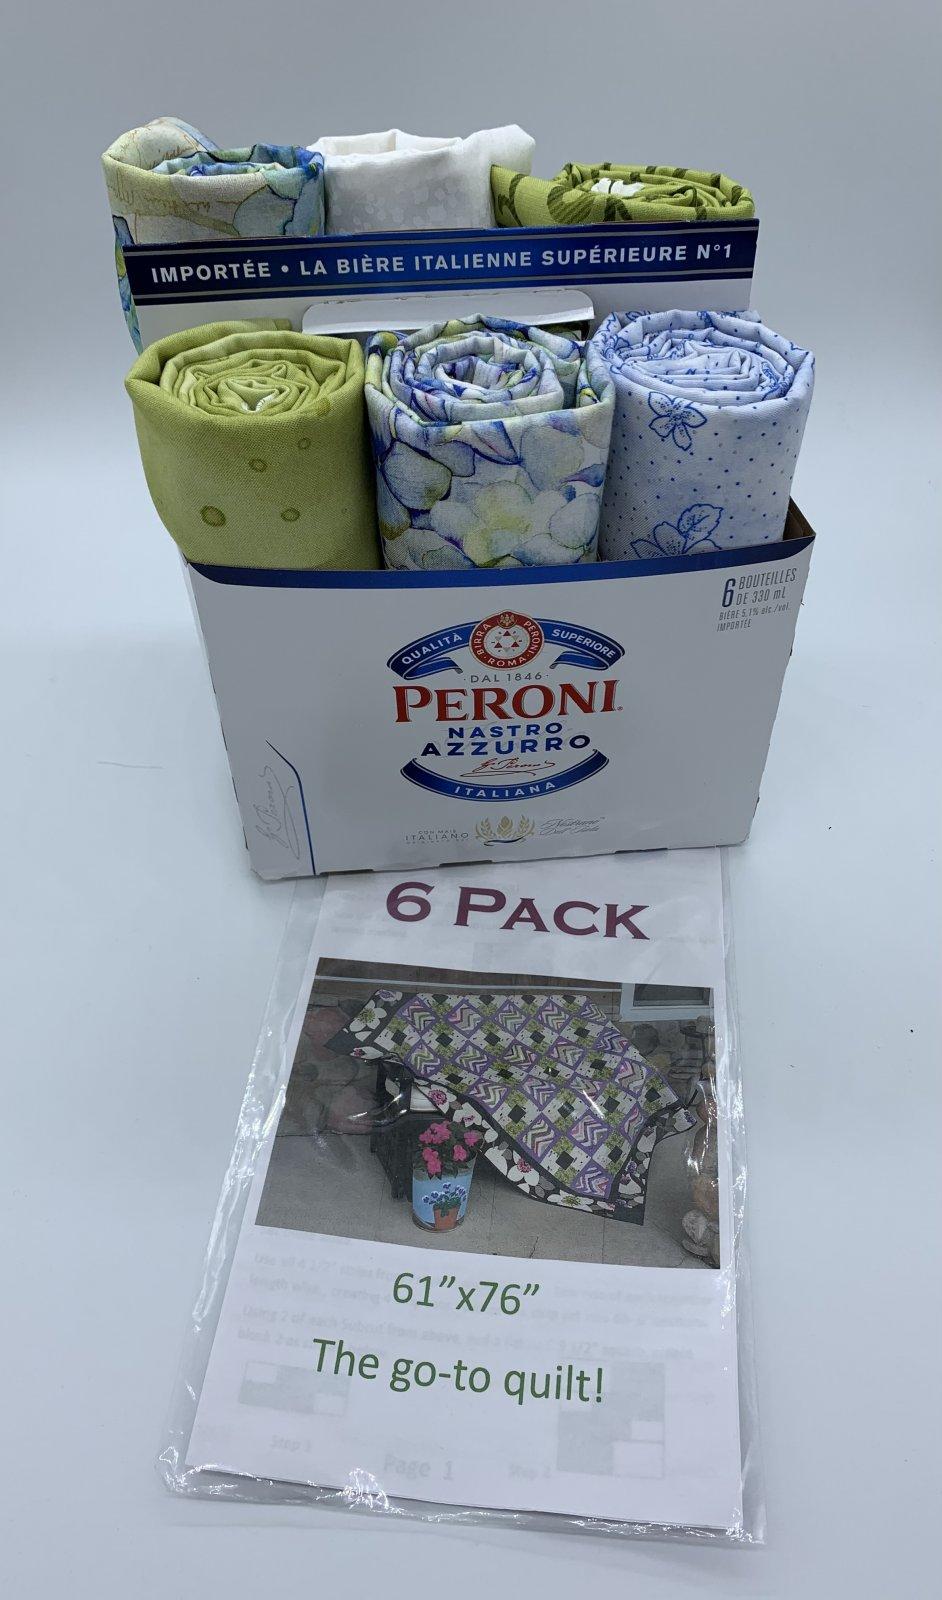 6 Pack Go-To Quilt Kit